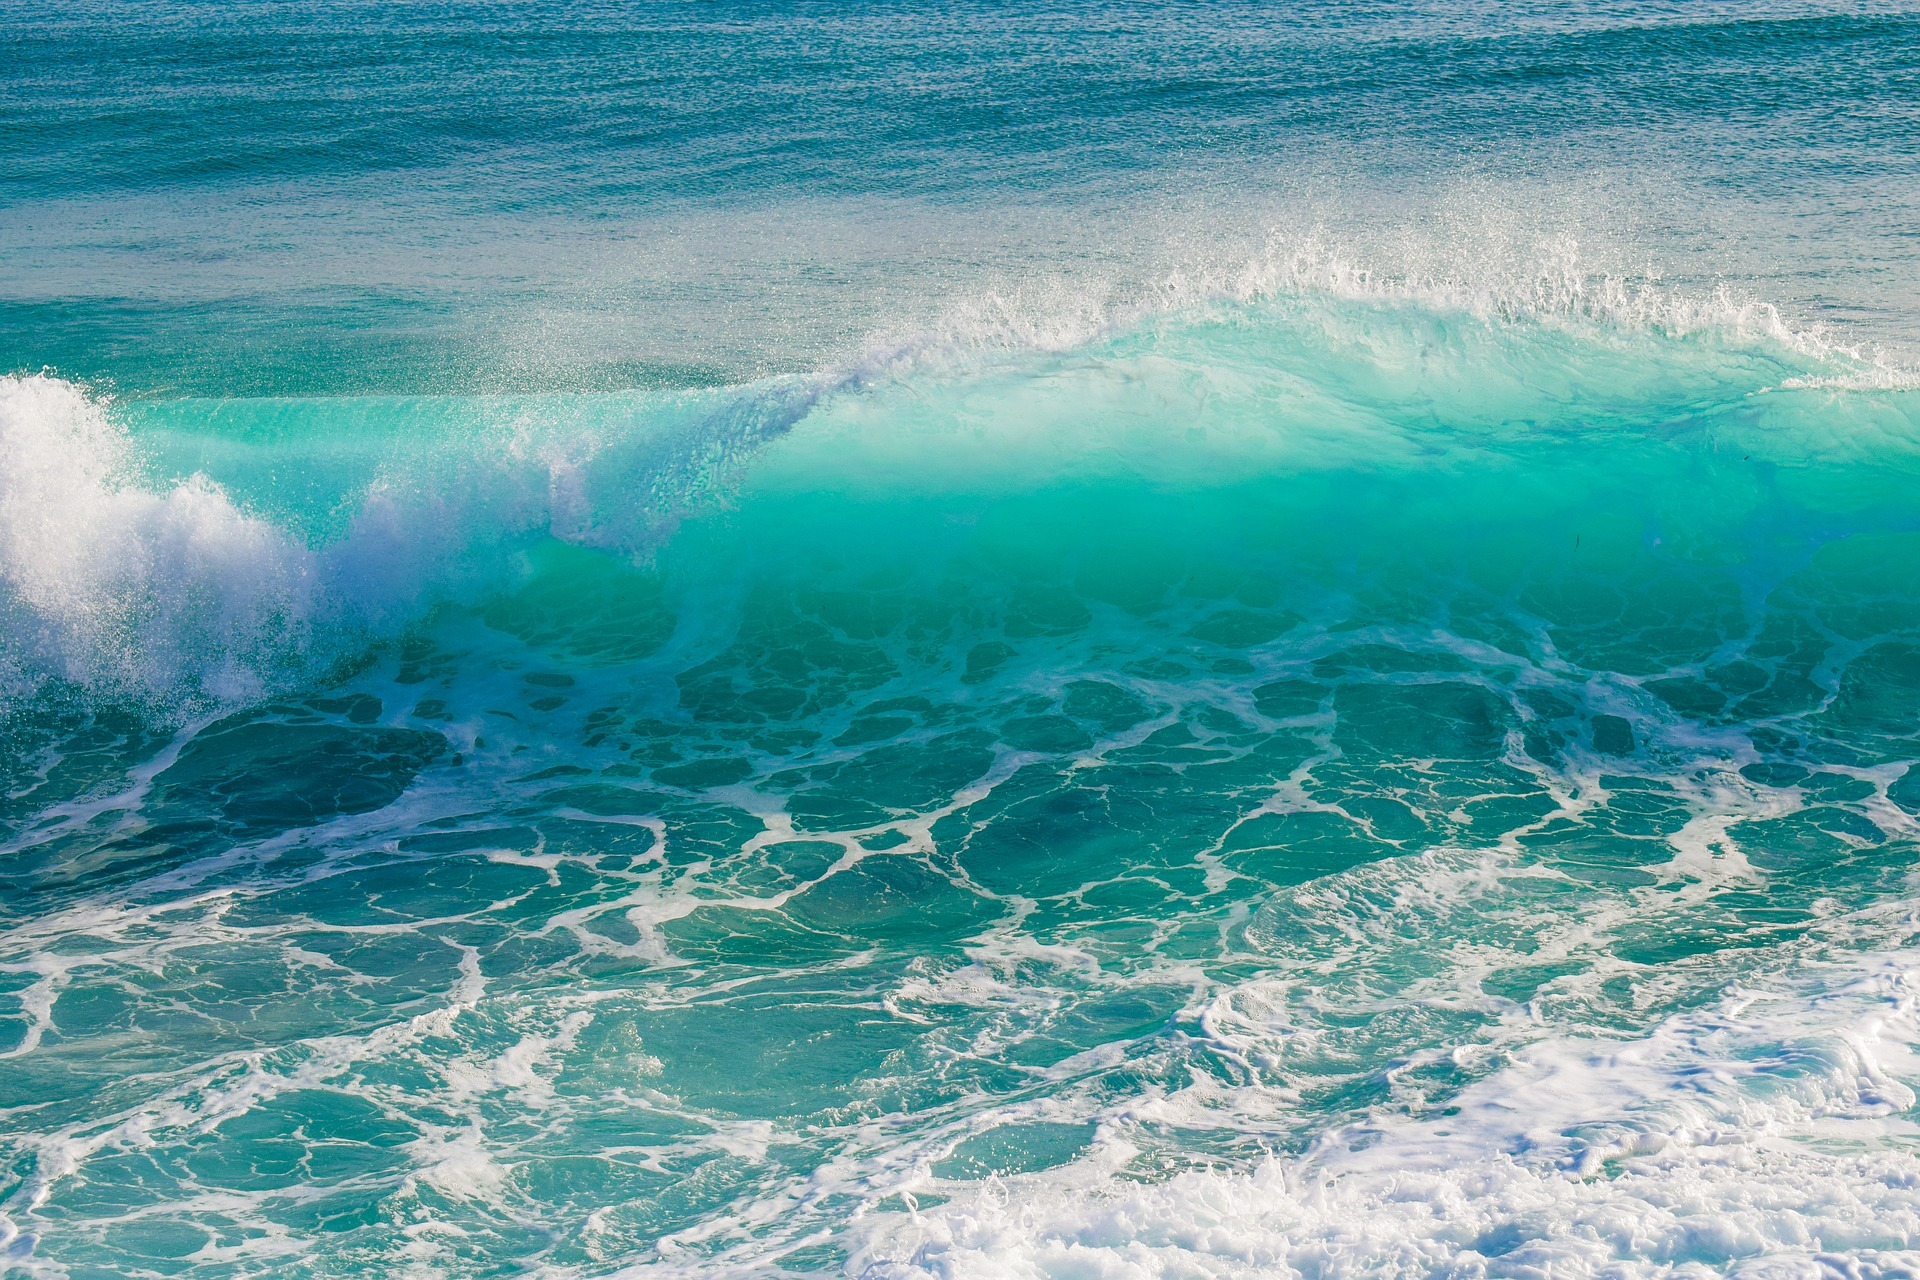 wave-2049985_1920.jpg